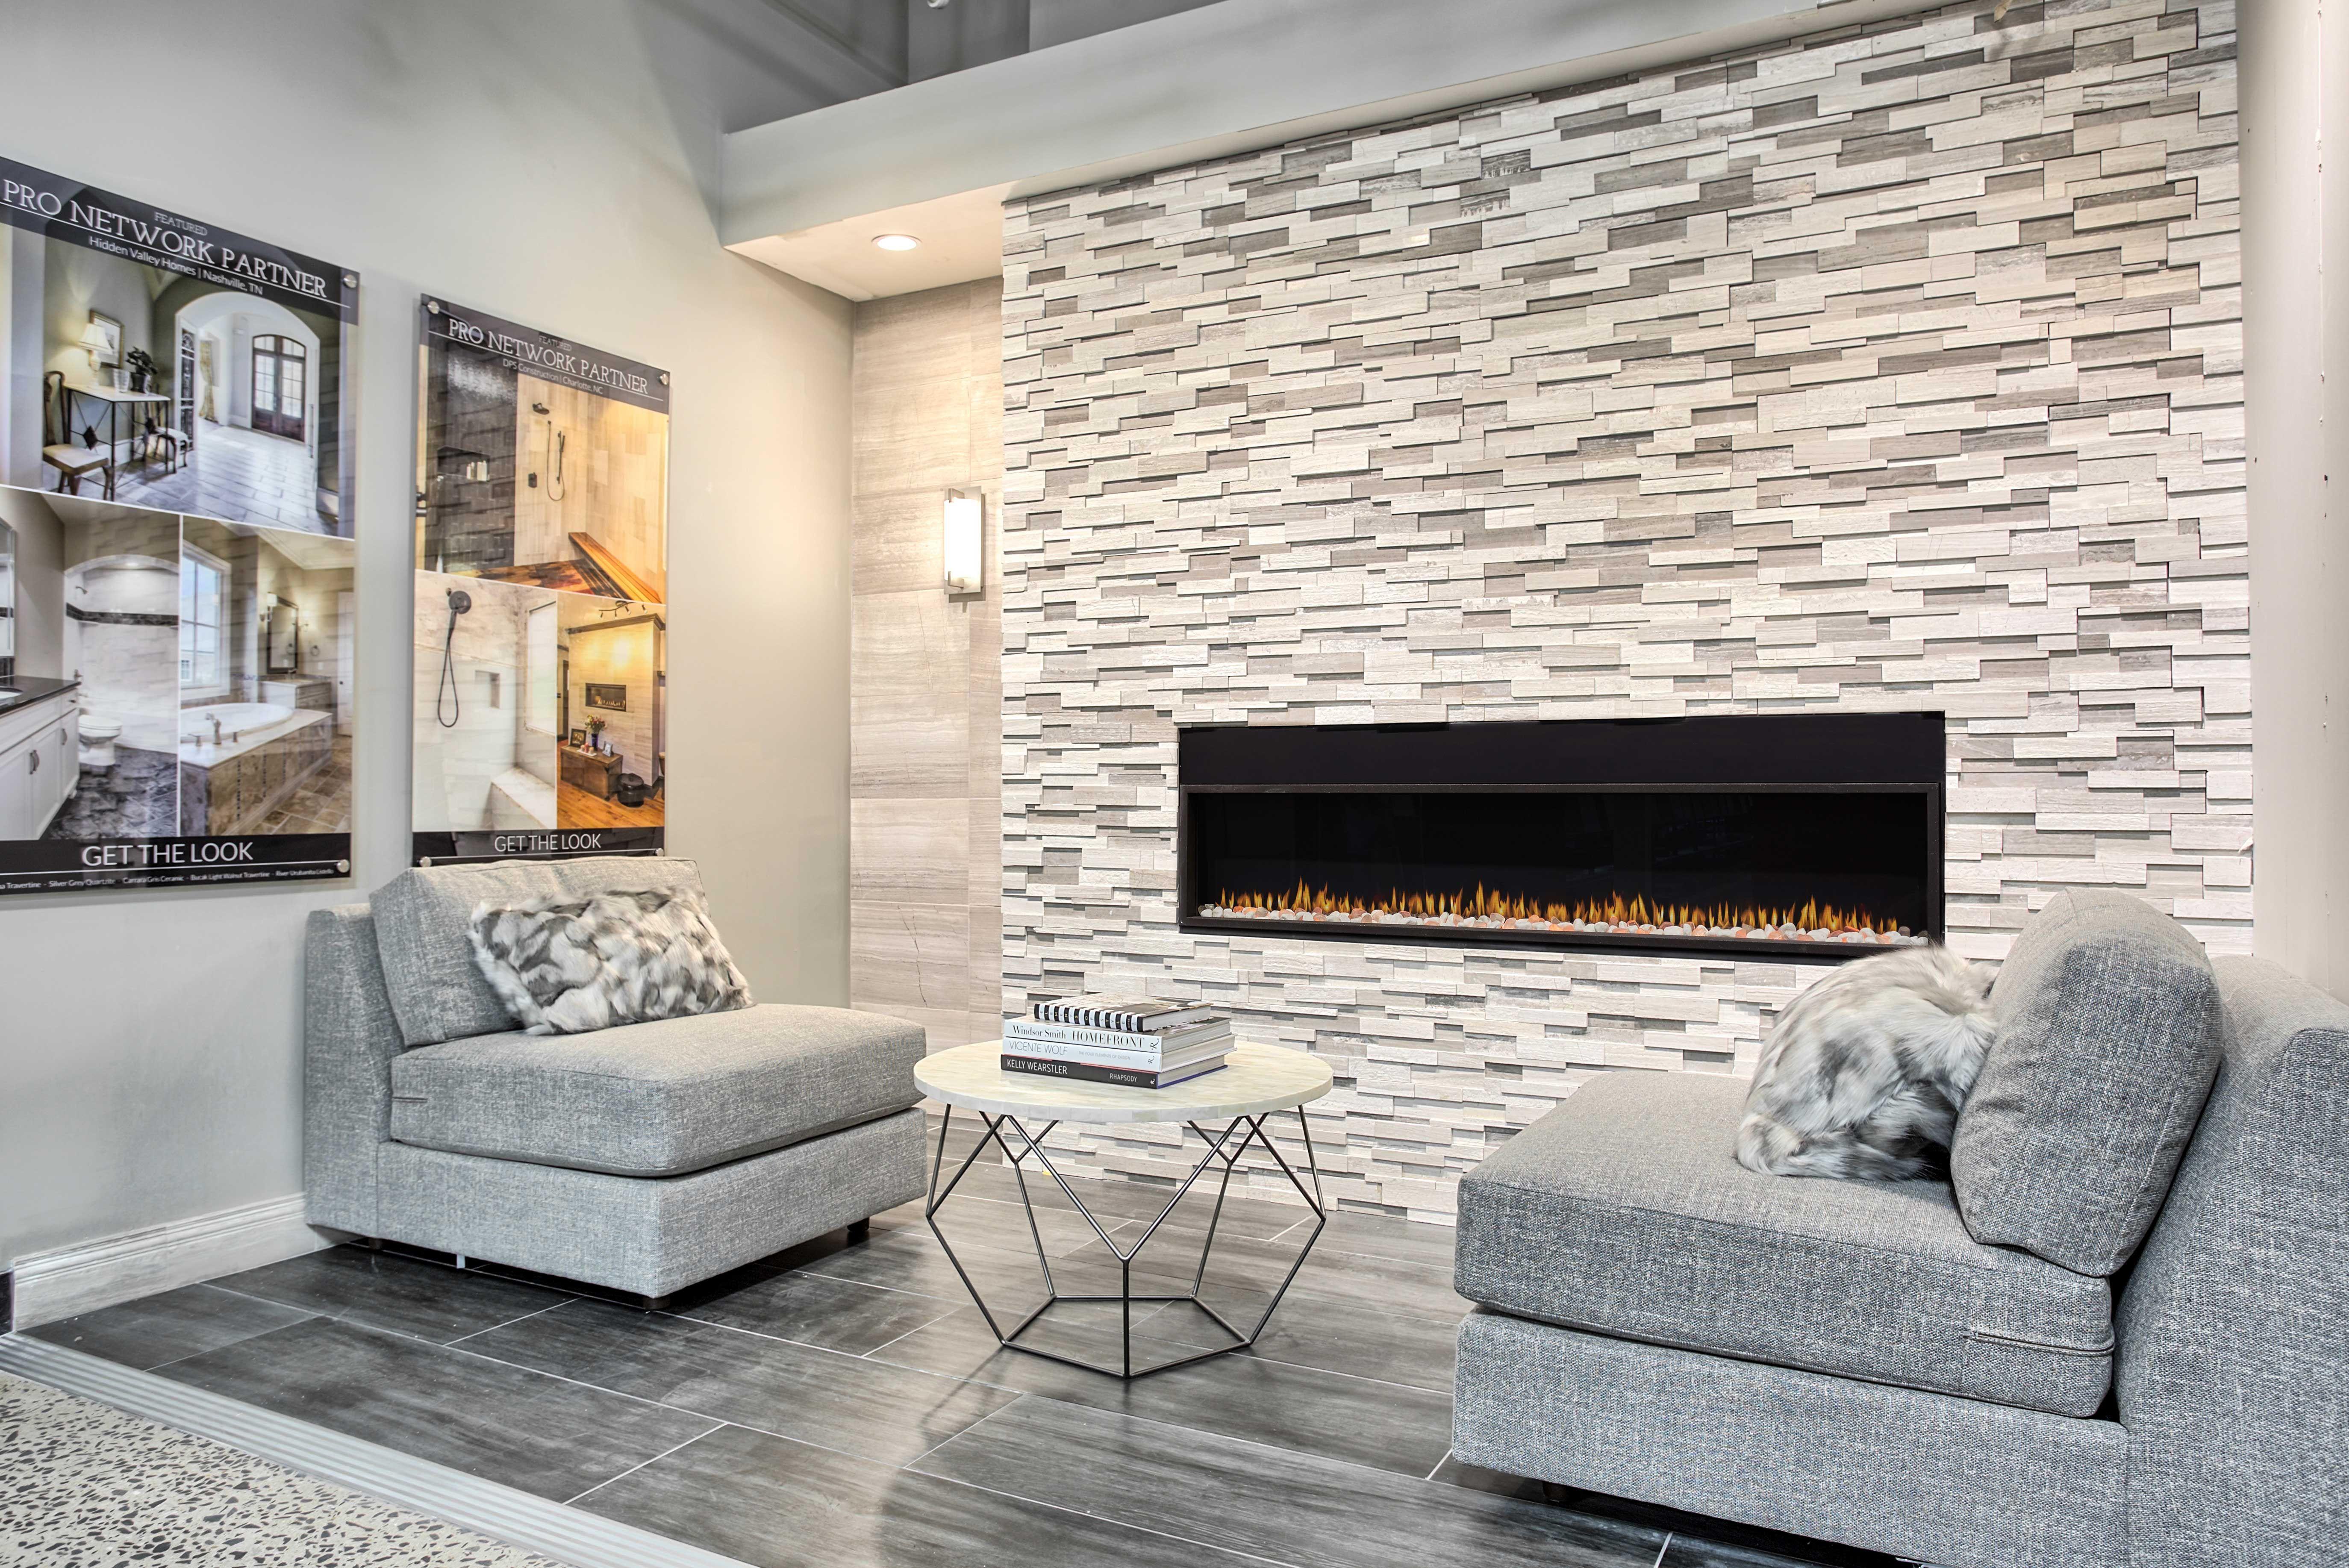 Fireplace Tile Legno Architectural Limestone Wall Tile Living